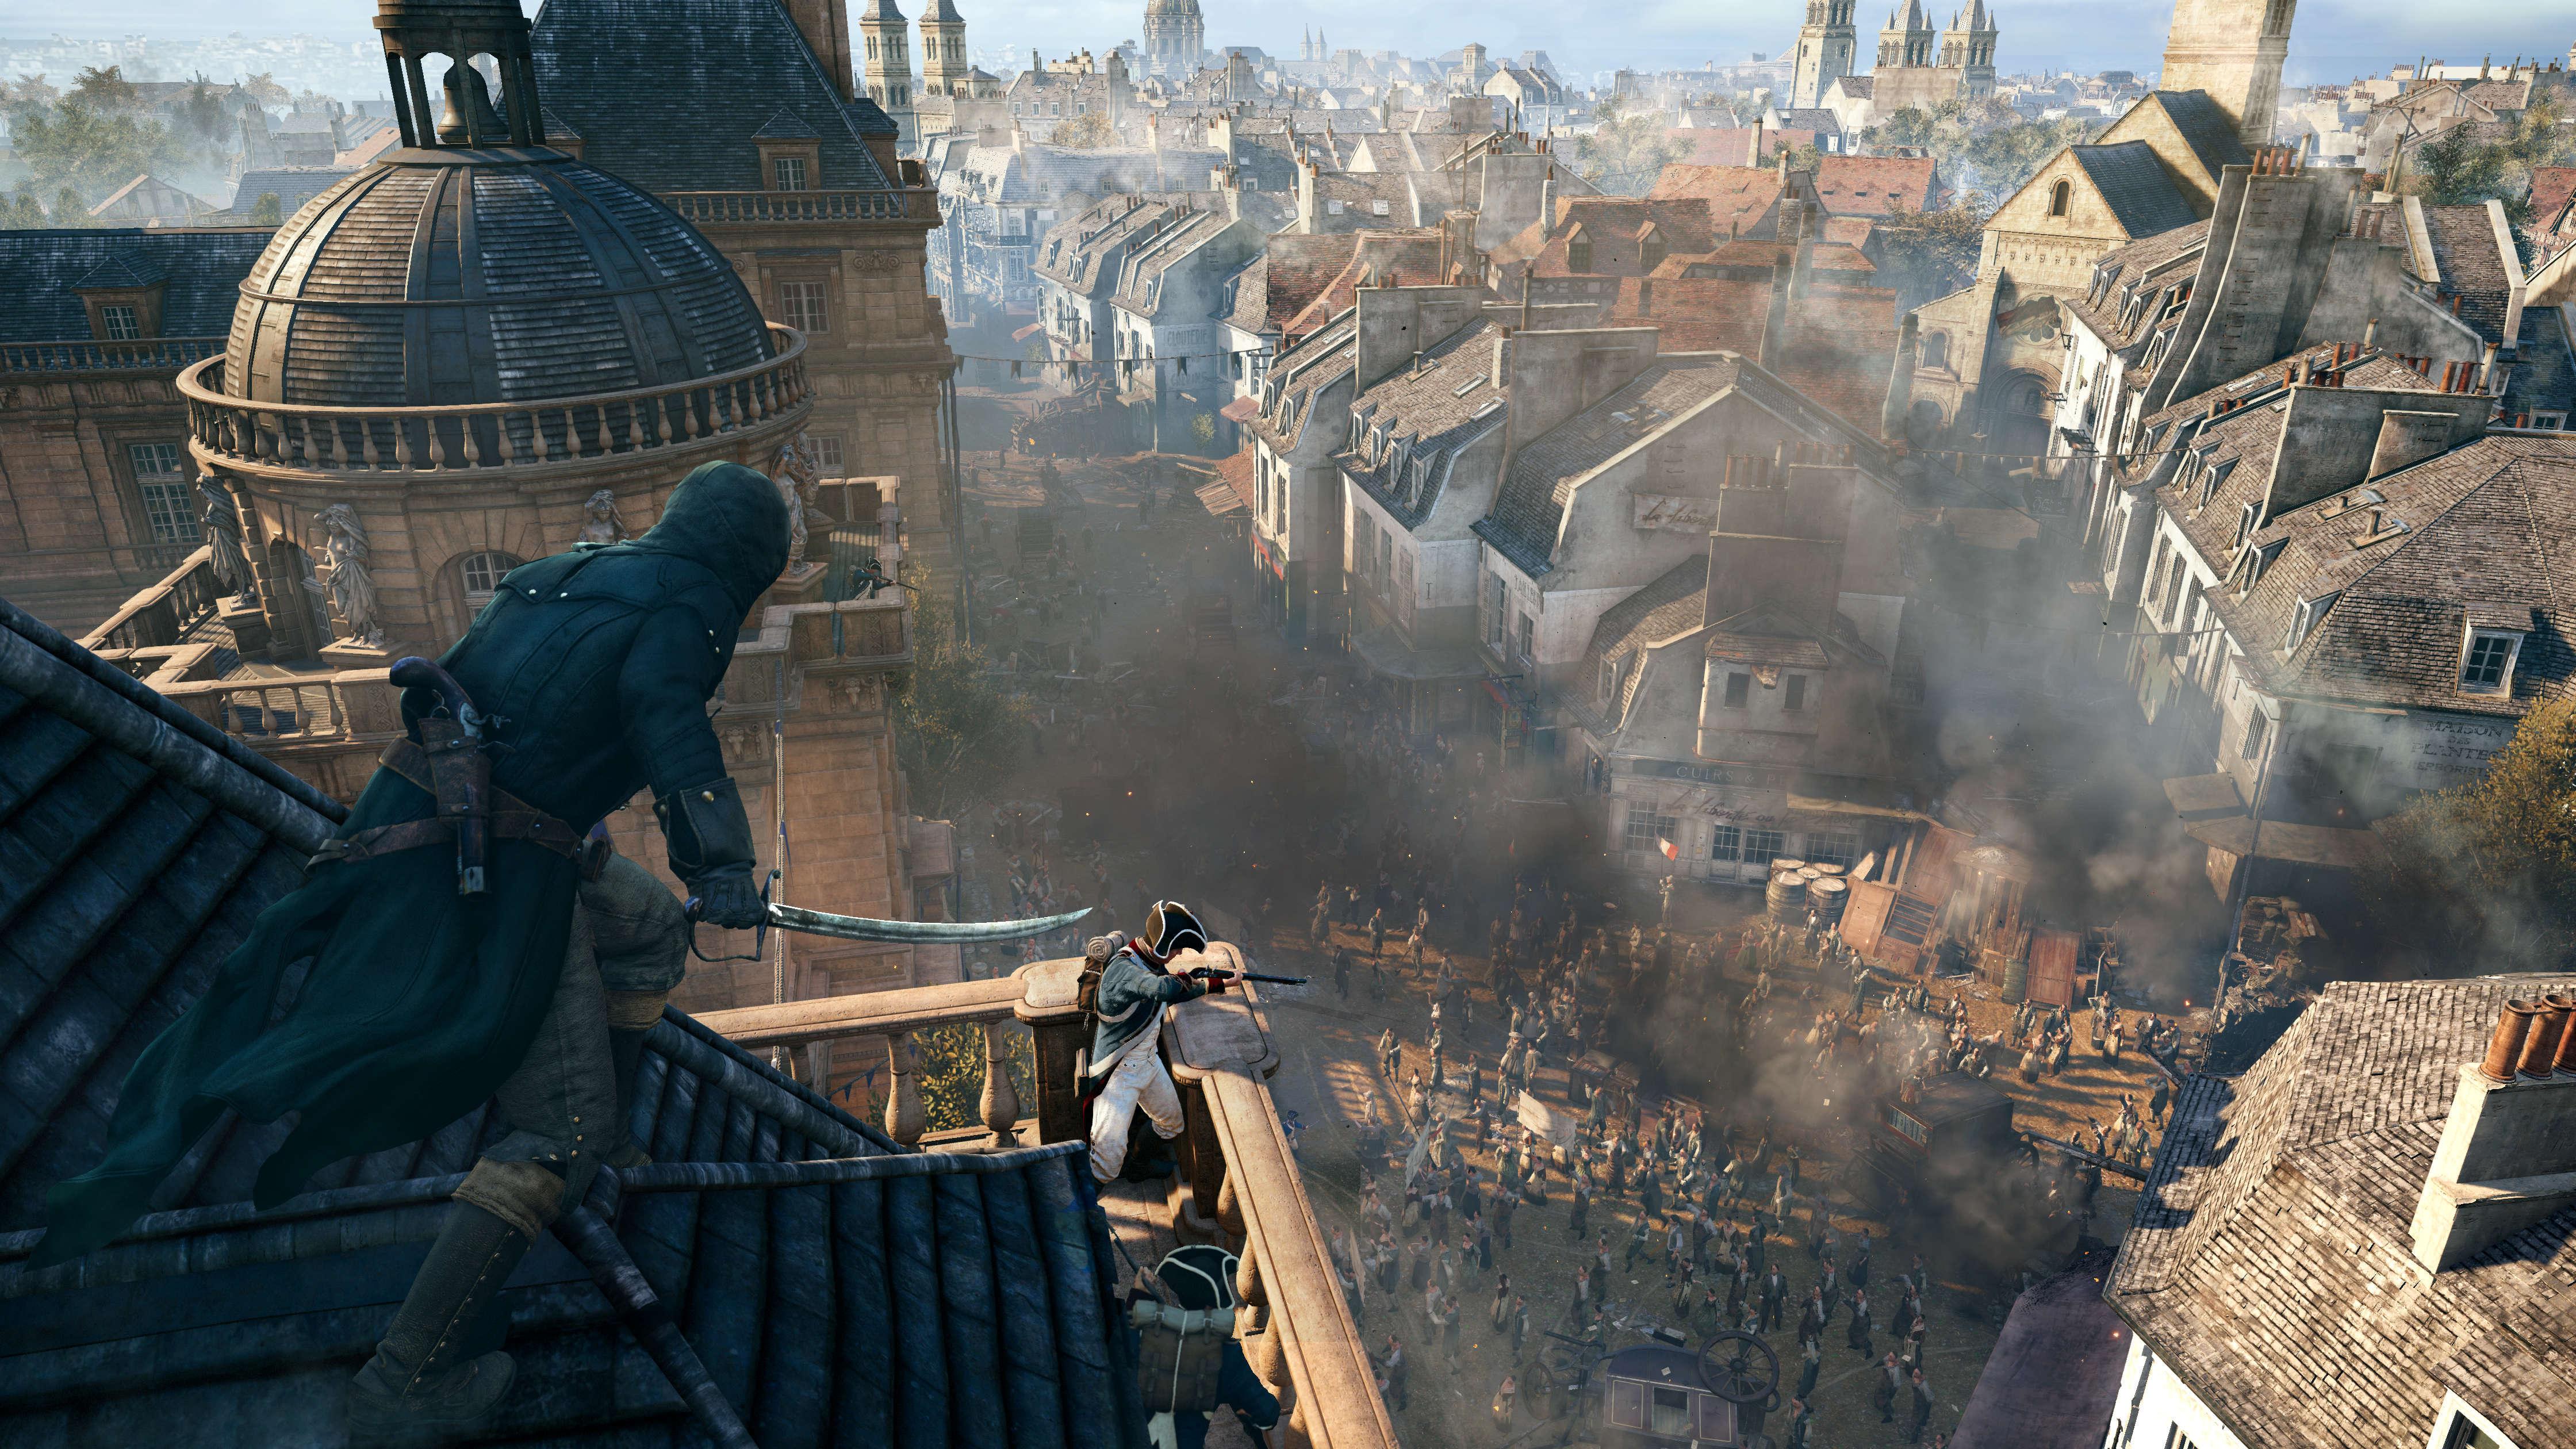 Free Download Wallpaper Assassin Creed Unity 03 Hd Wallpaper